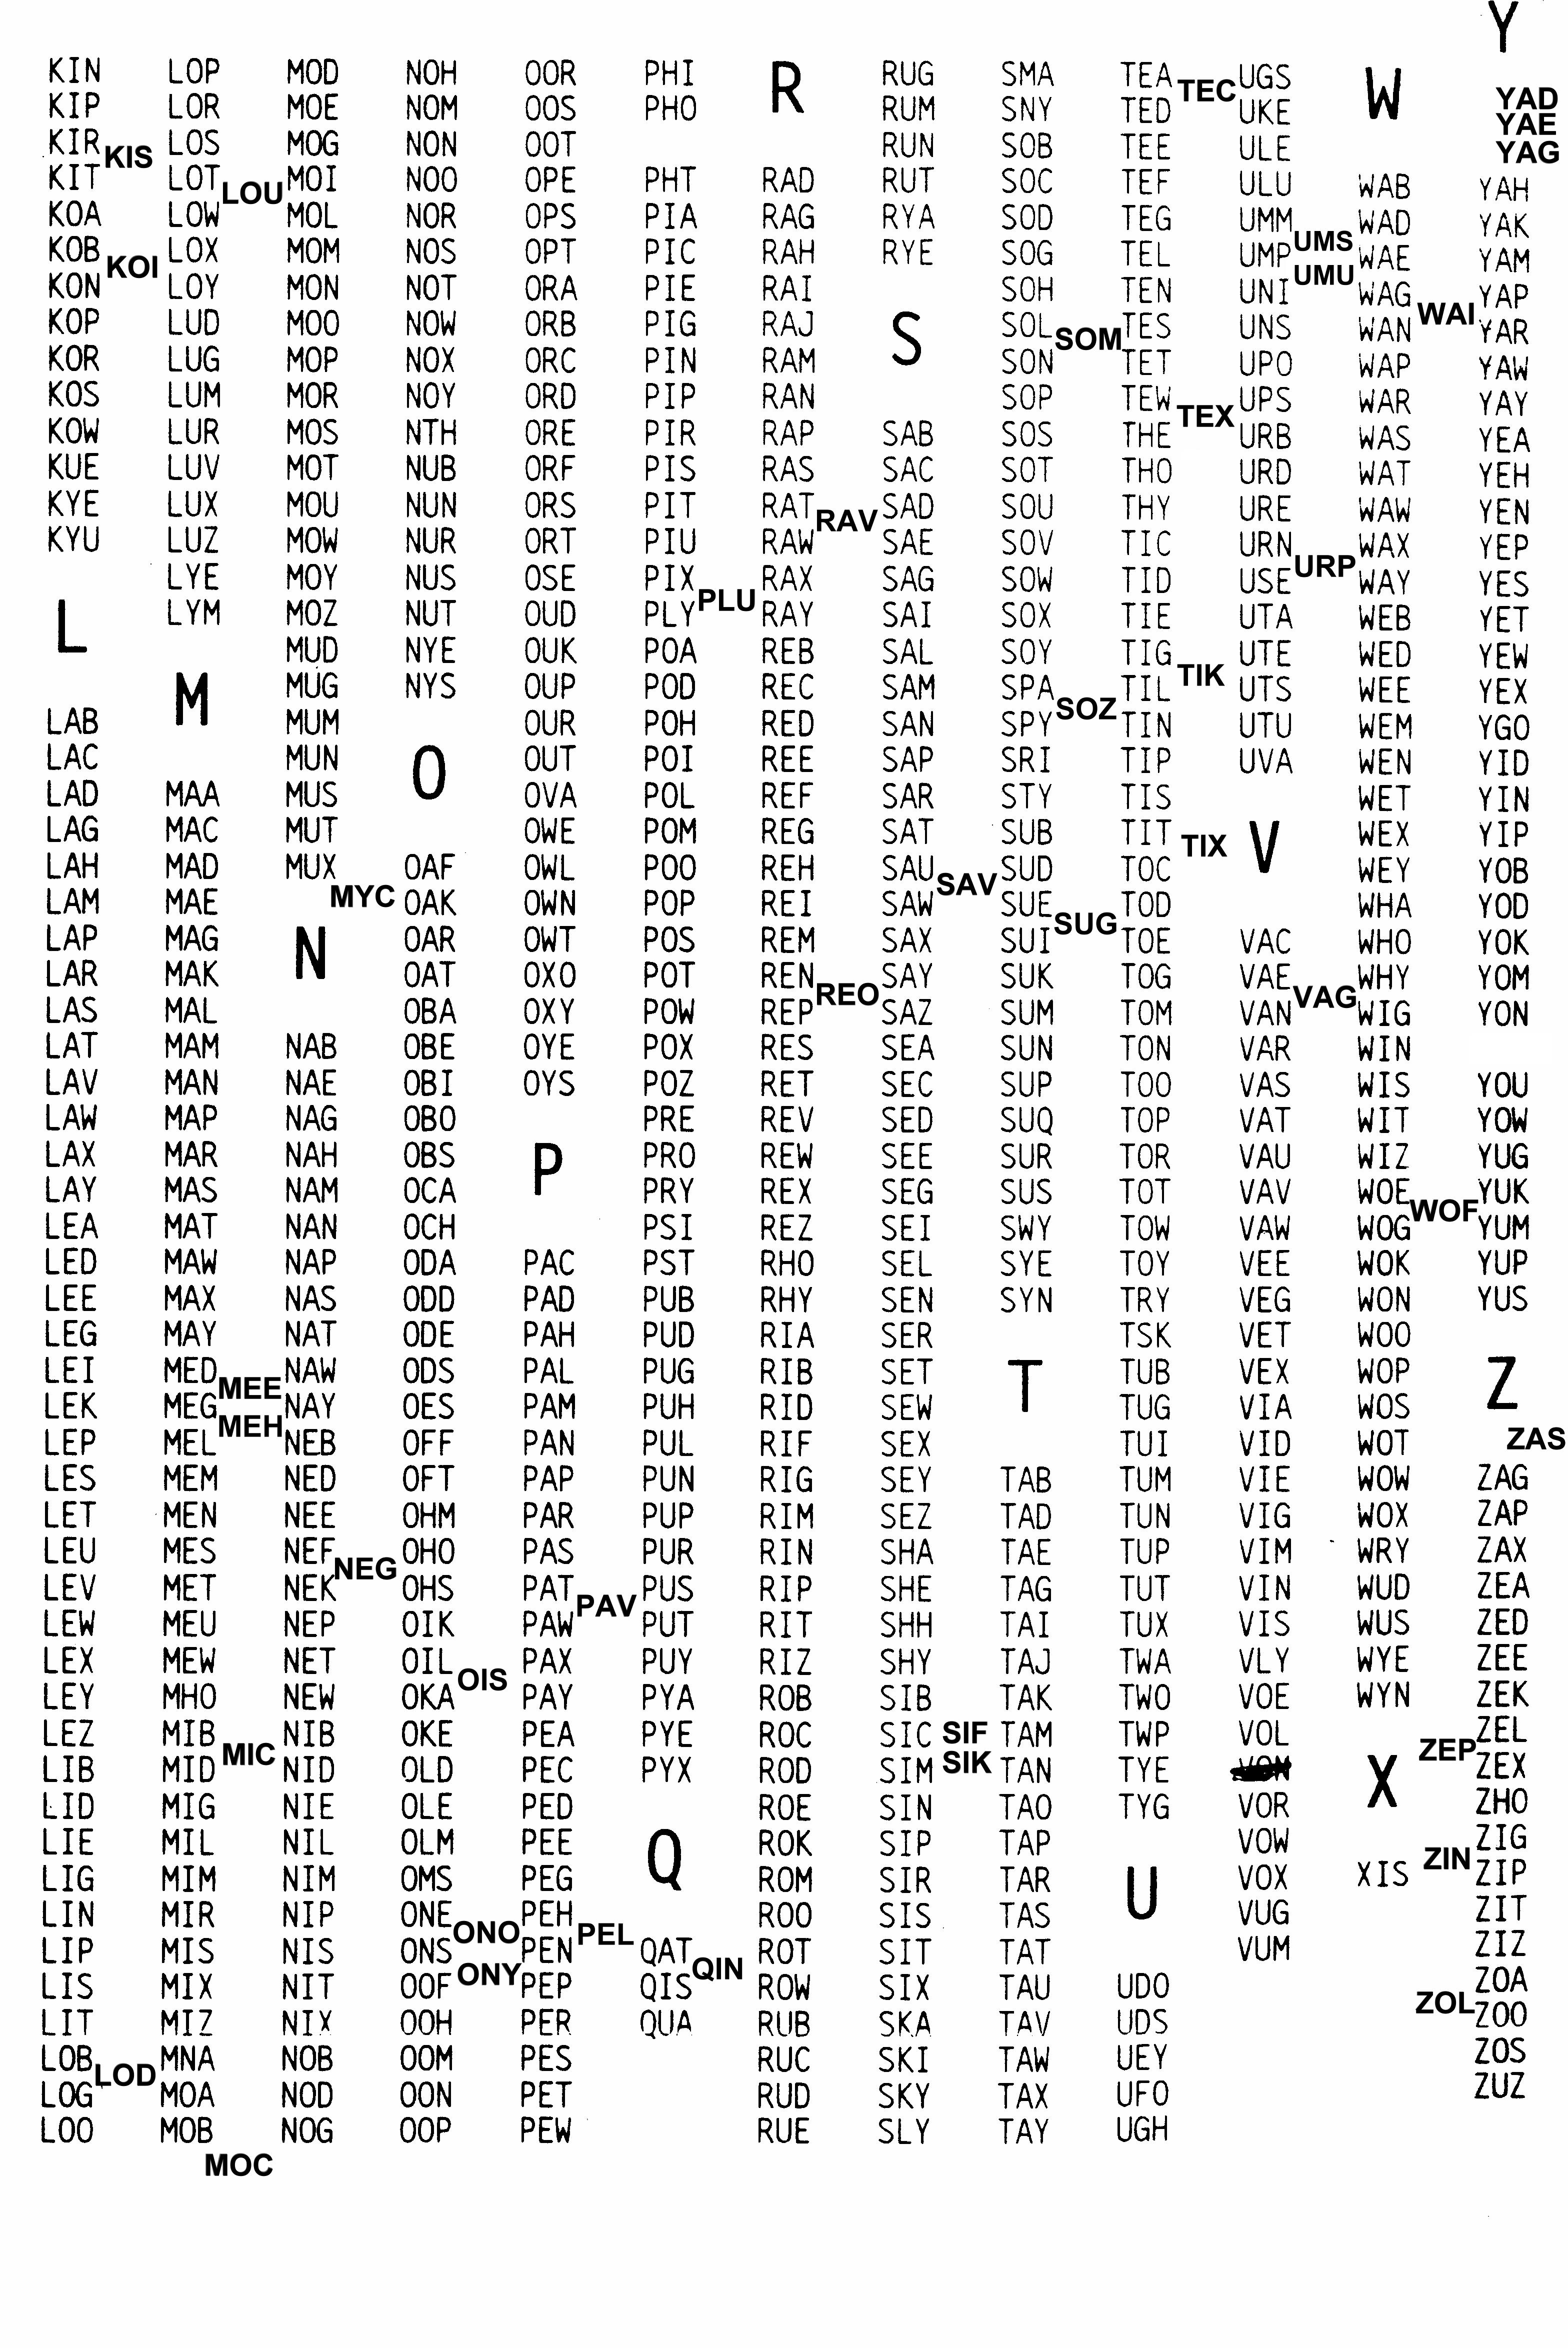 Scrabble 2 Letter Word List